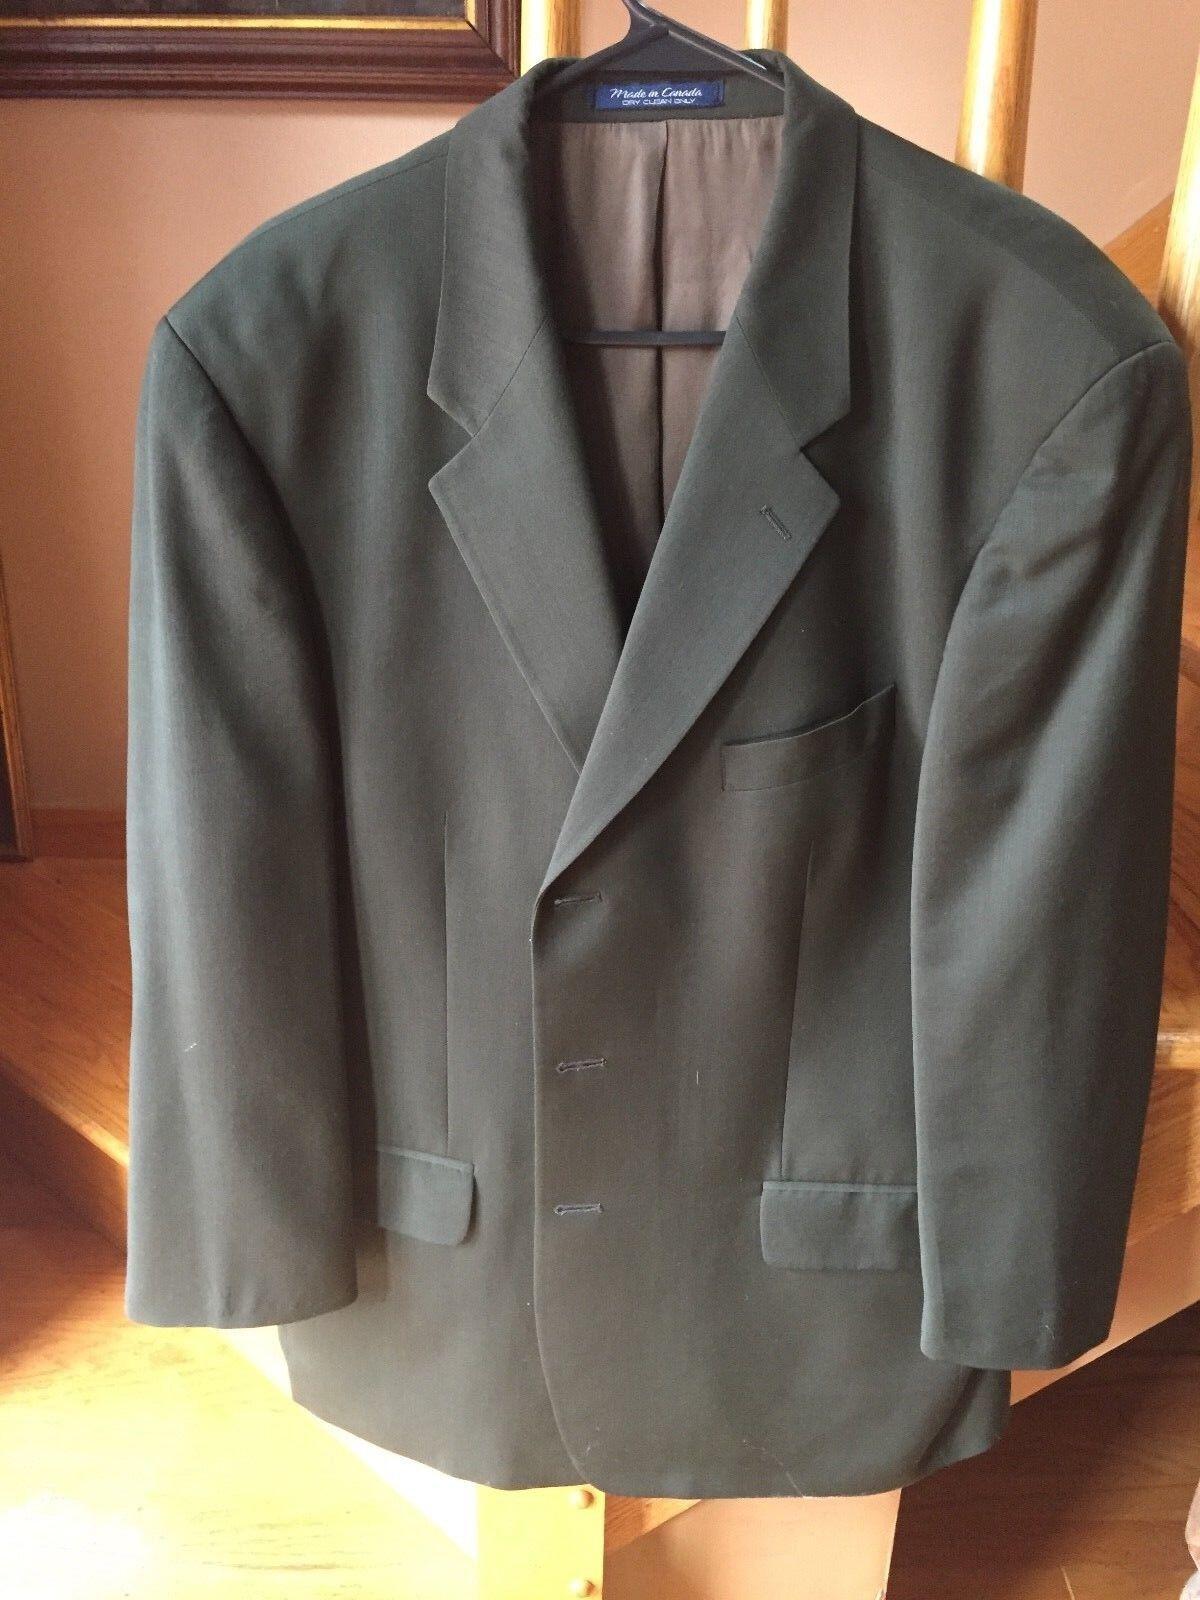 Sanlorenzo Olive Grün  100% Wool 3 Button Lined Blazer Sz 44R